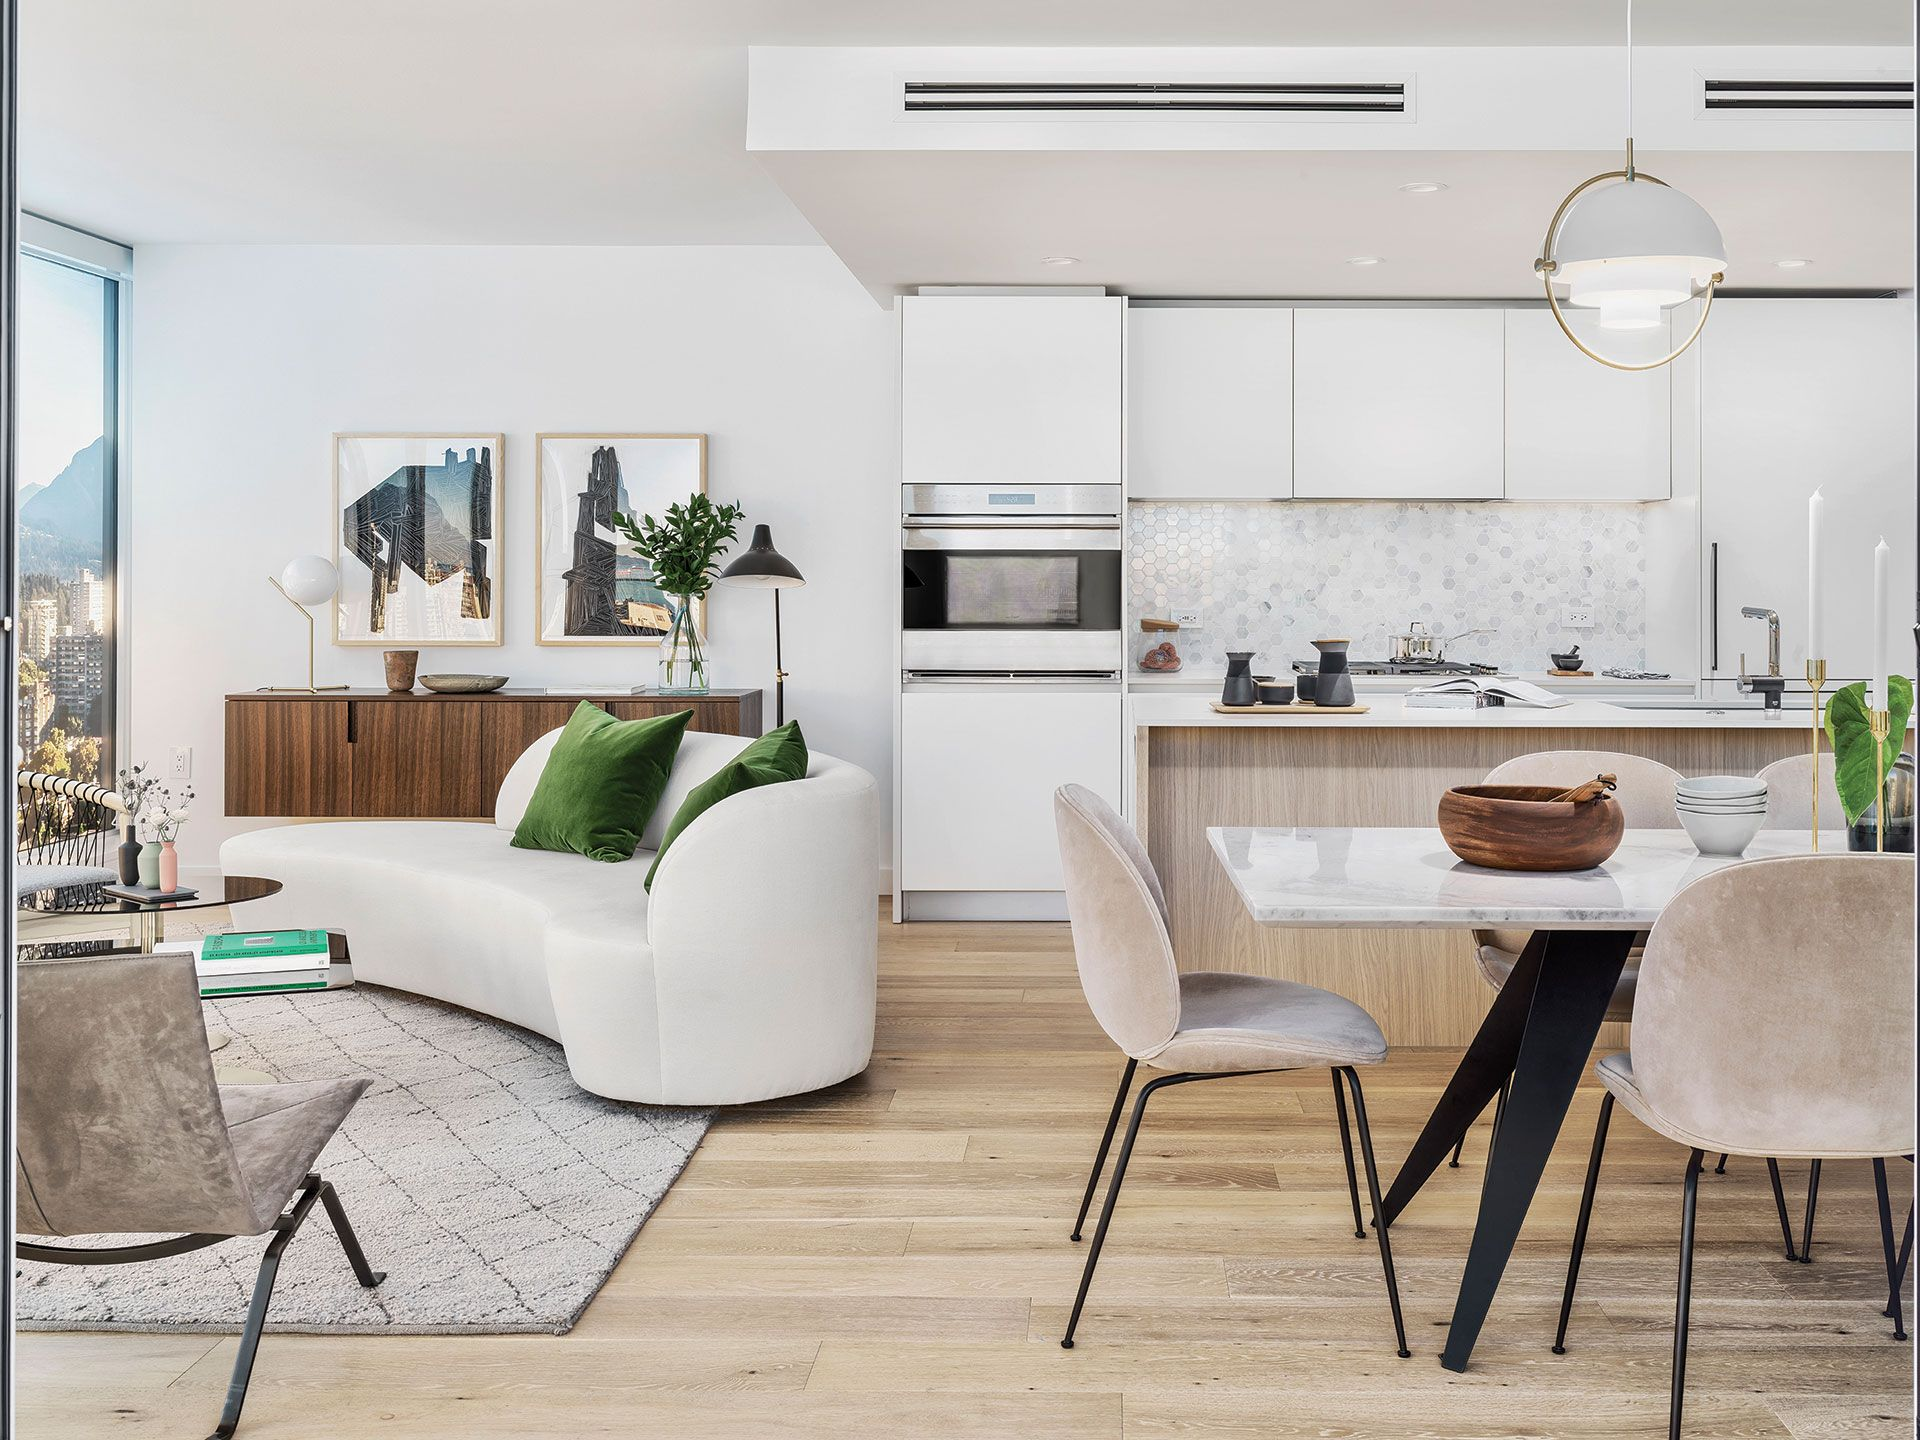 3 Unique Ways to Design an Open-Concept Condo Kitchen ...